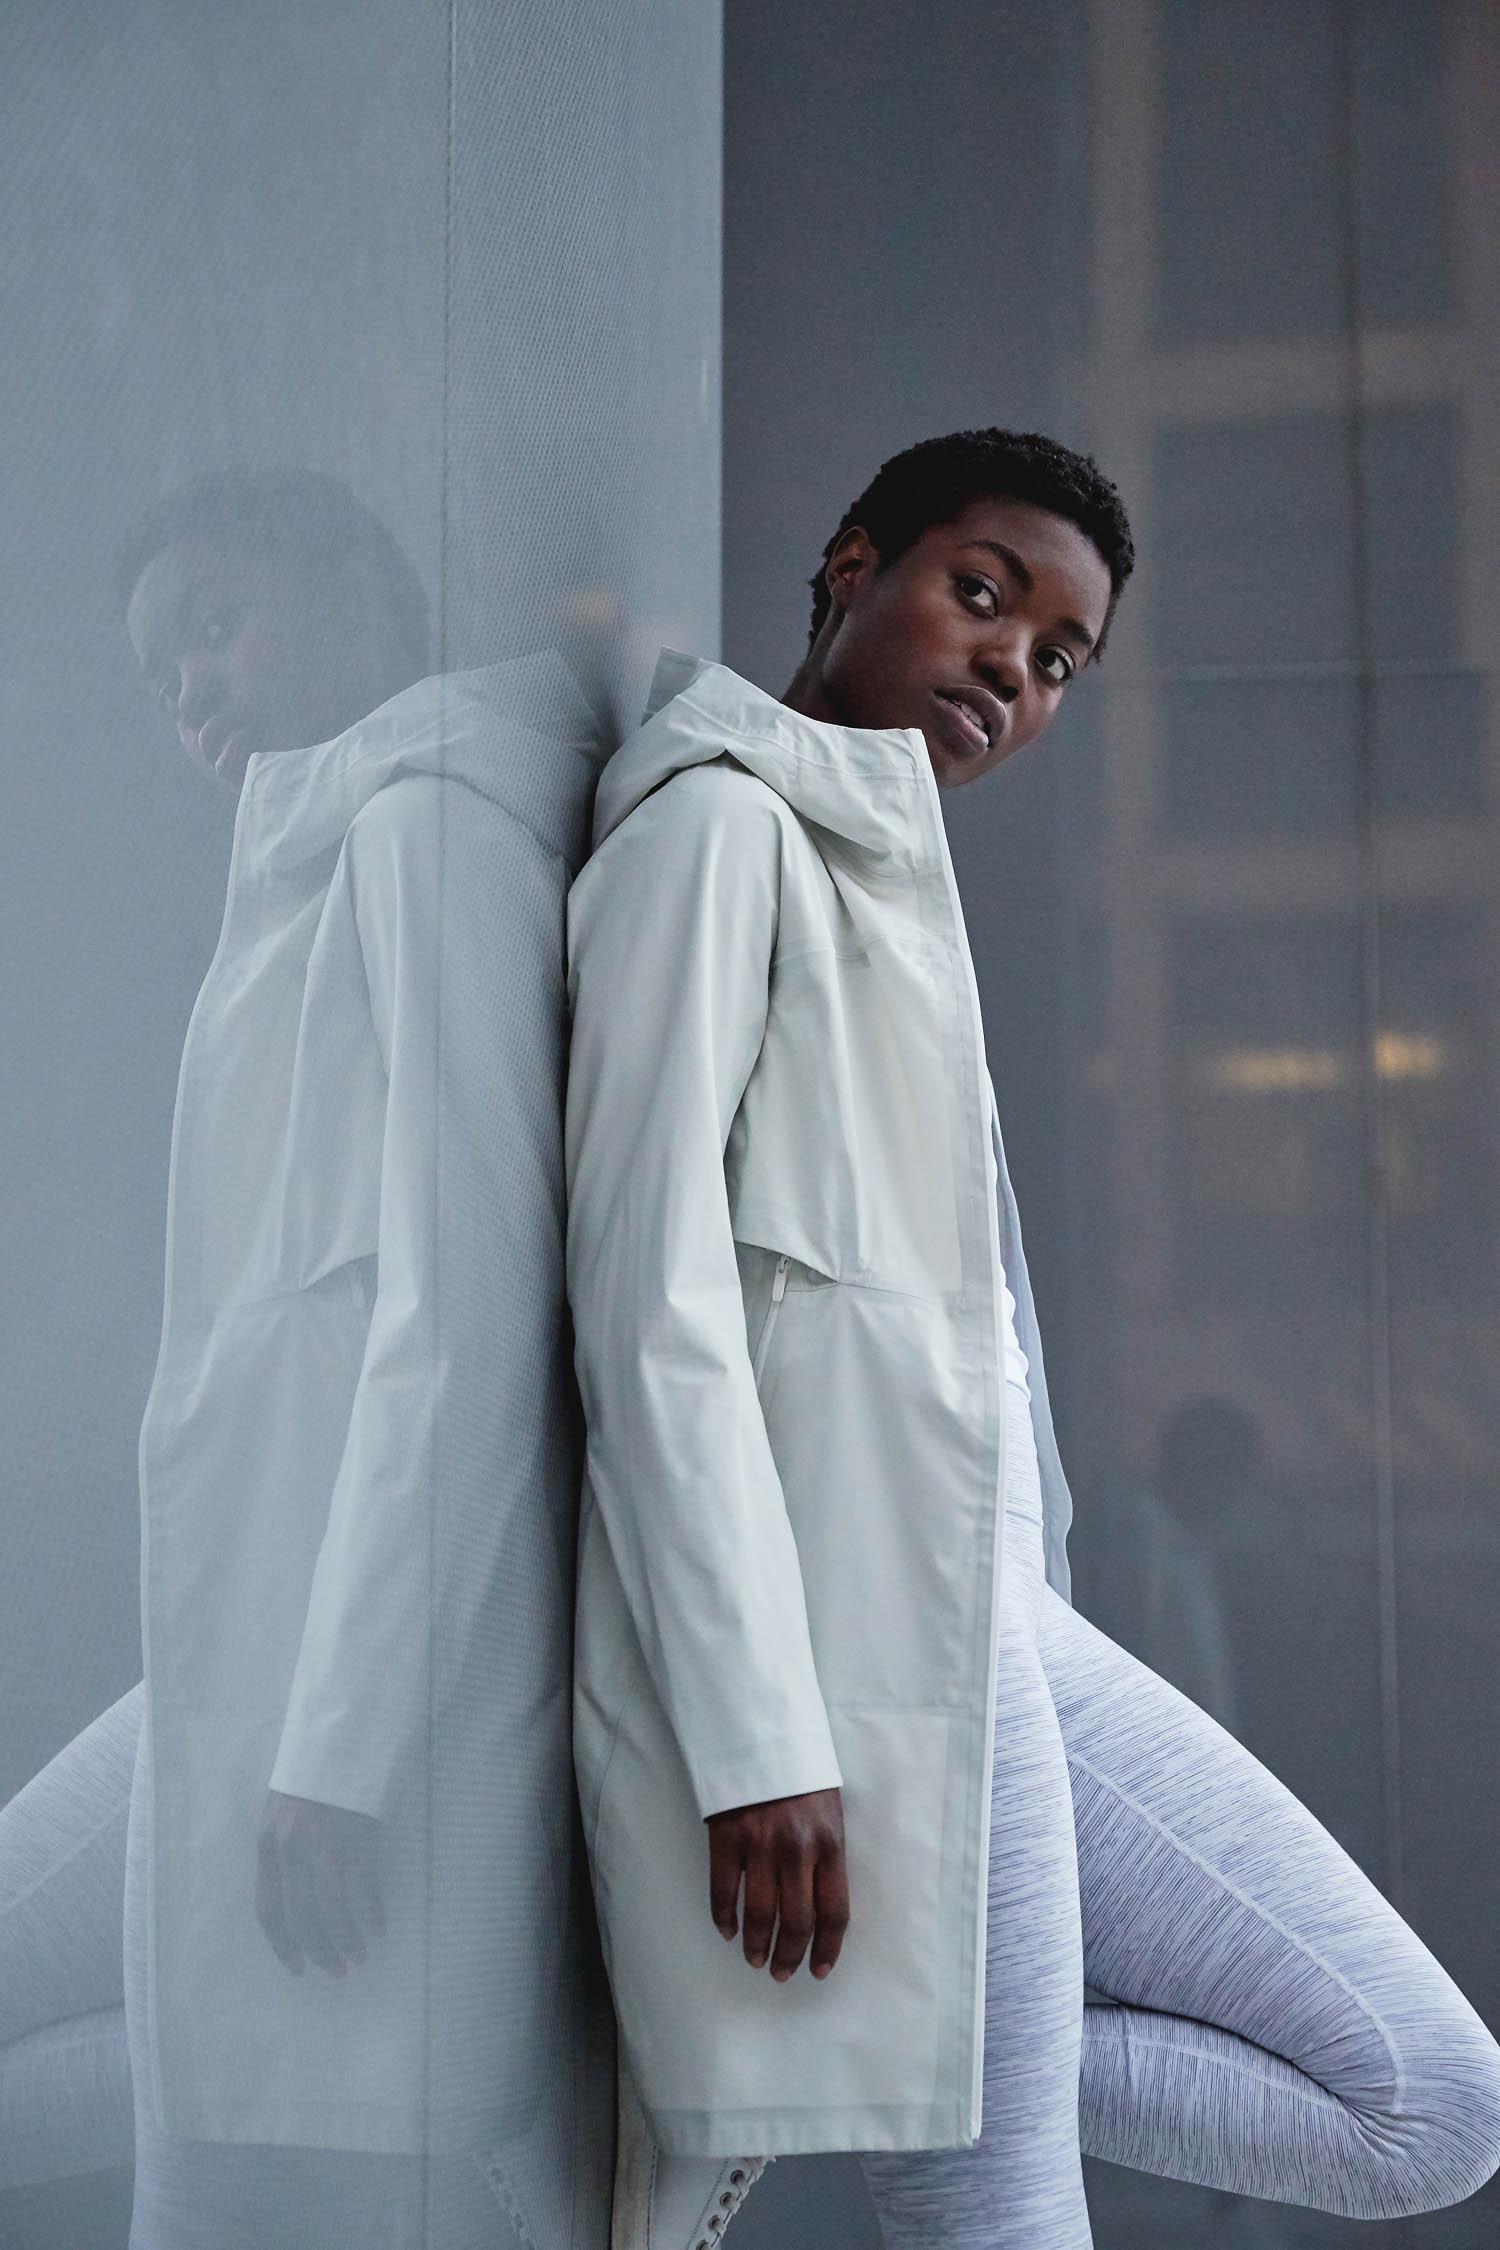 lululemon-rain-jacket-Abigail-Whitney-6075-MK-Matt-Korinek-Photography-Copyright-2018-SQSP-1500px.jpg